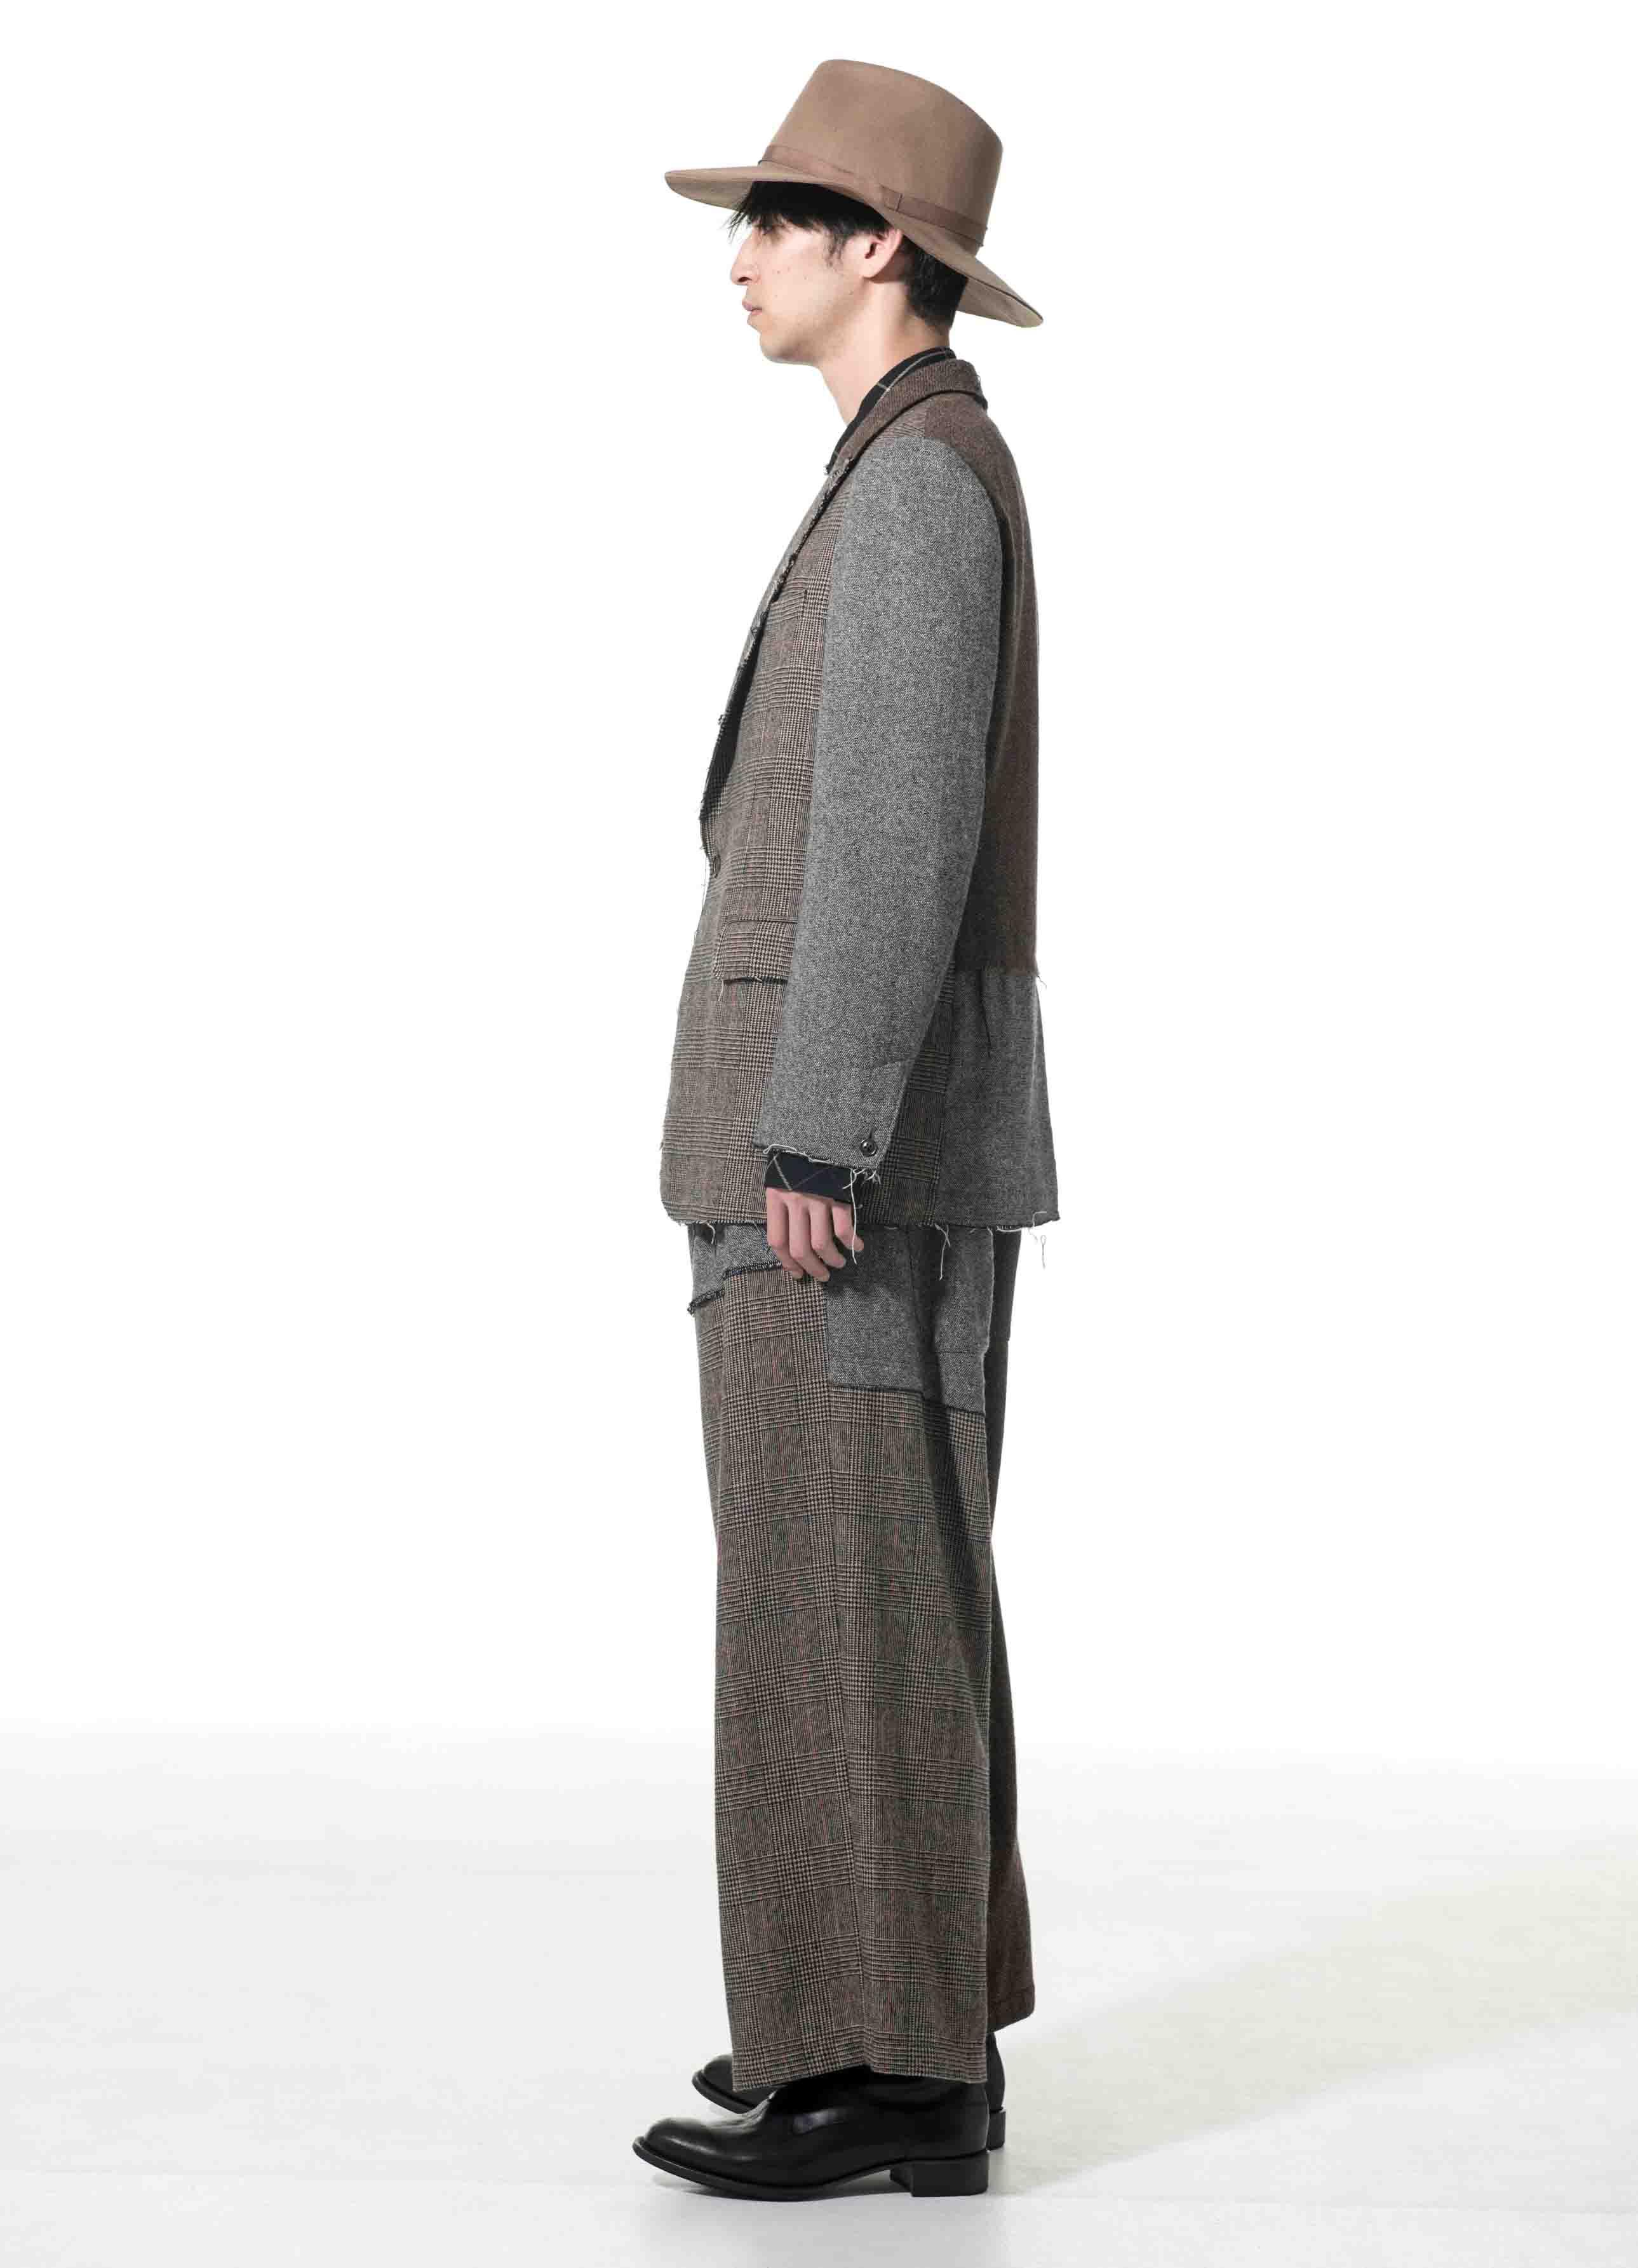 Crazy tweed Peak Lapel Jacket